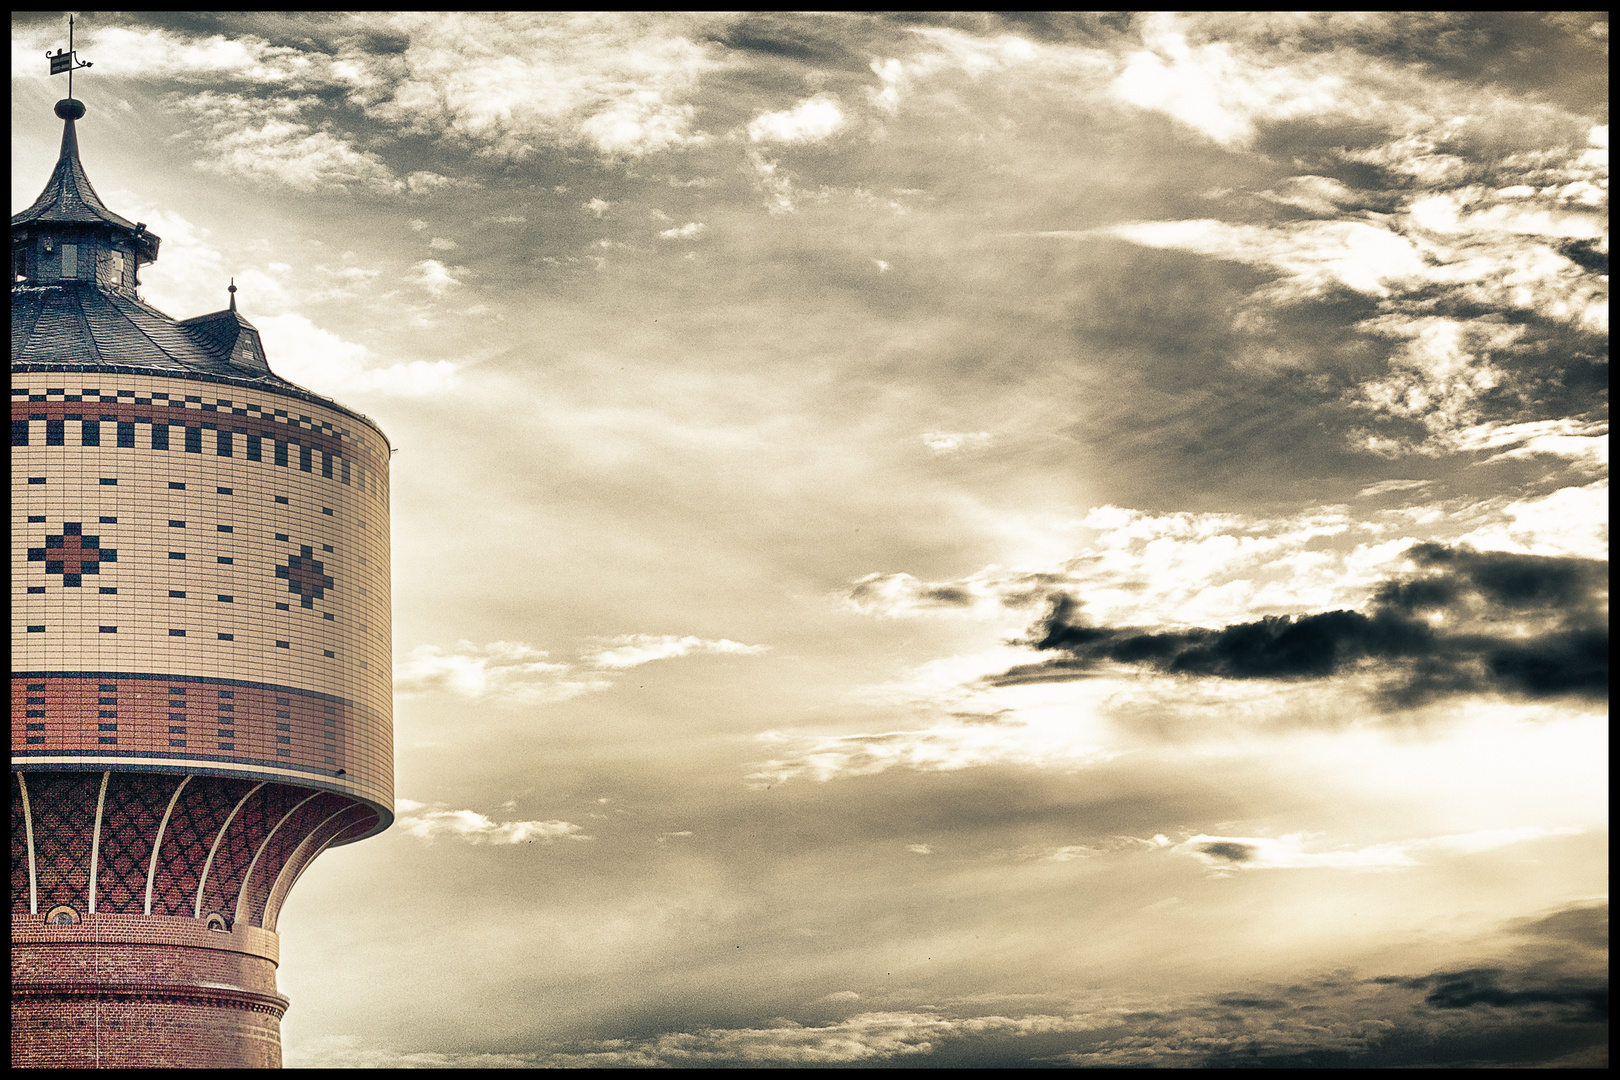 Wasserturm bei Mittweida 2